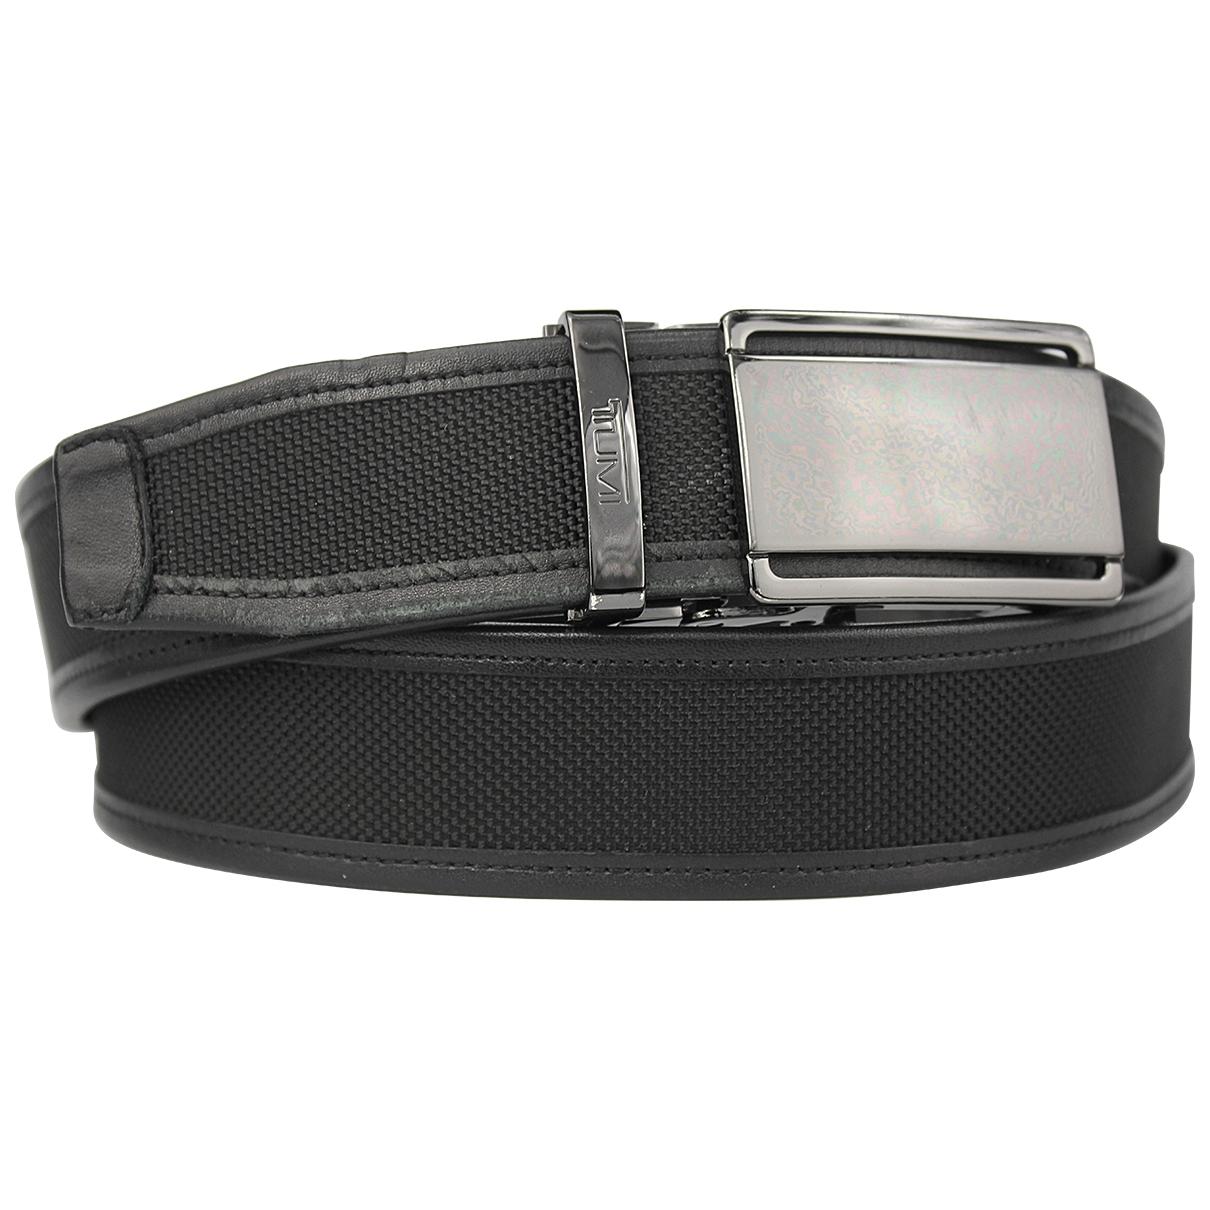 Tumi \N Black Leather belt for Men M international